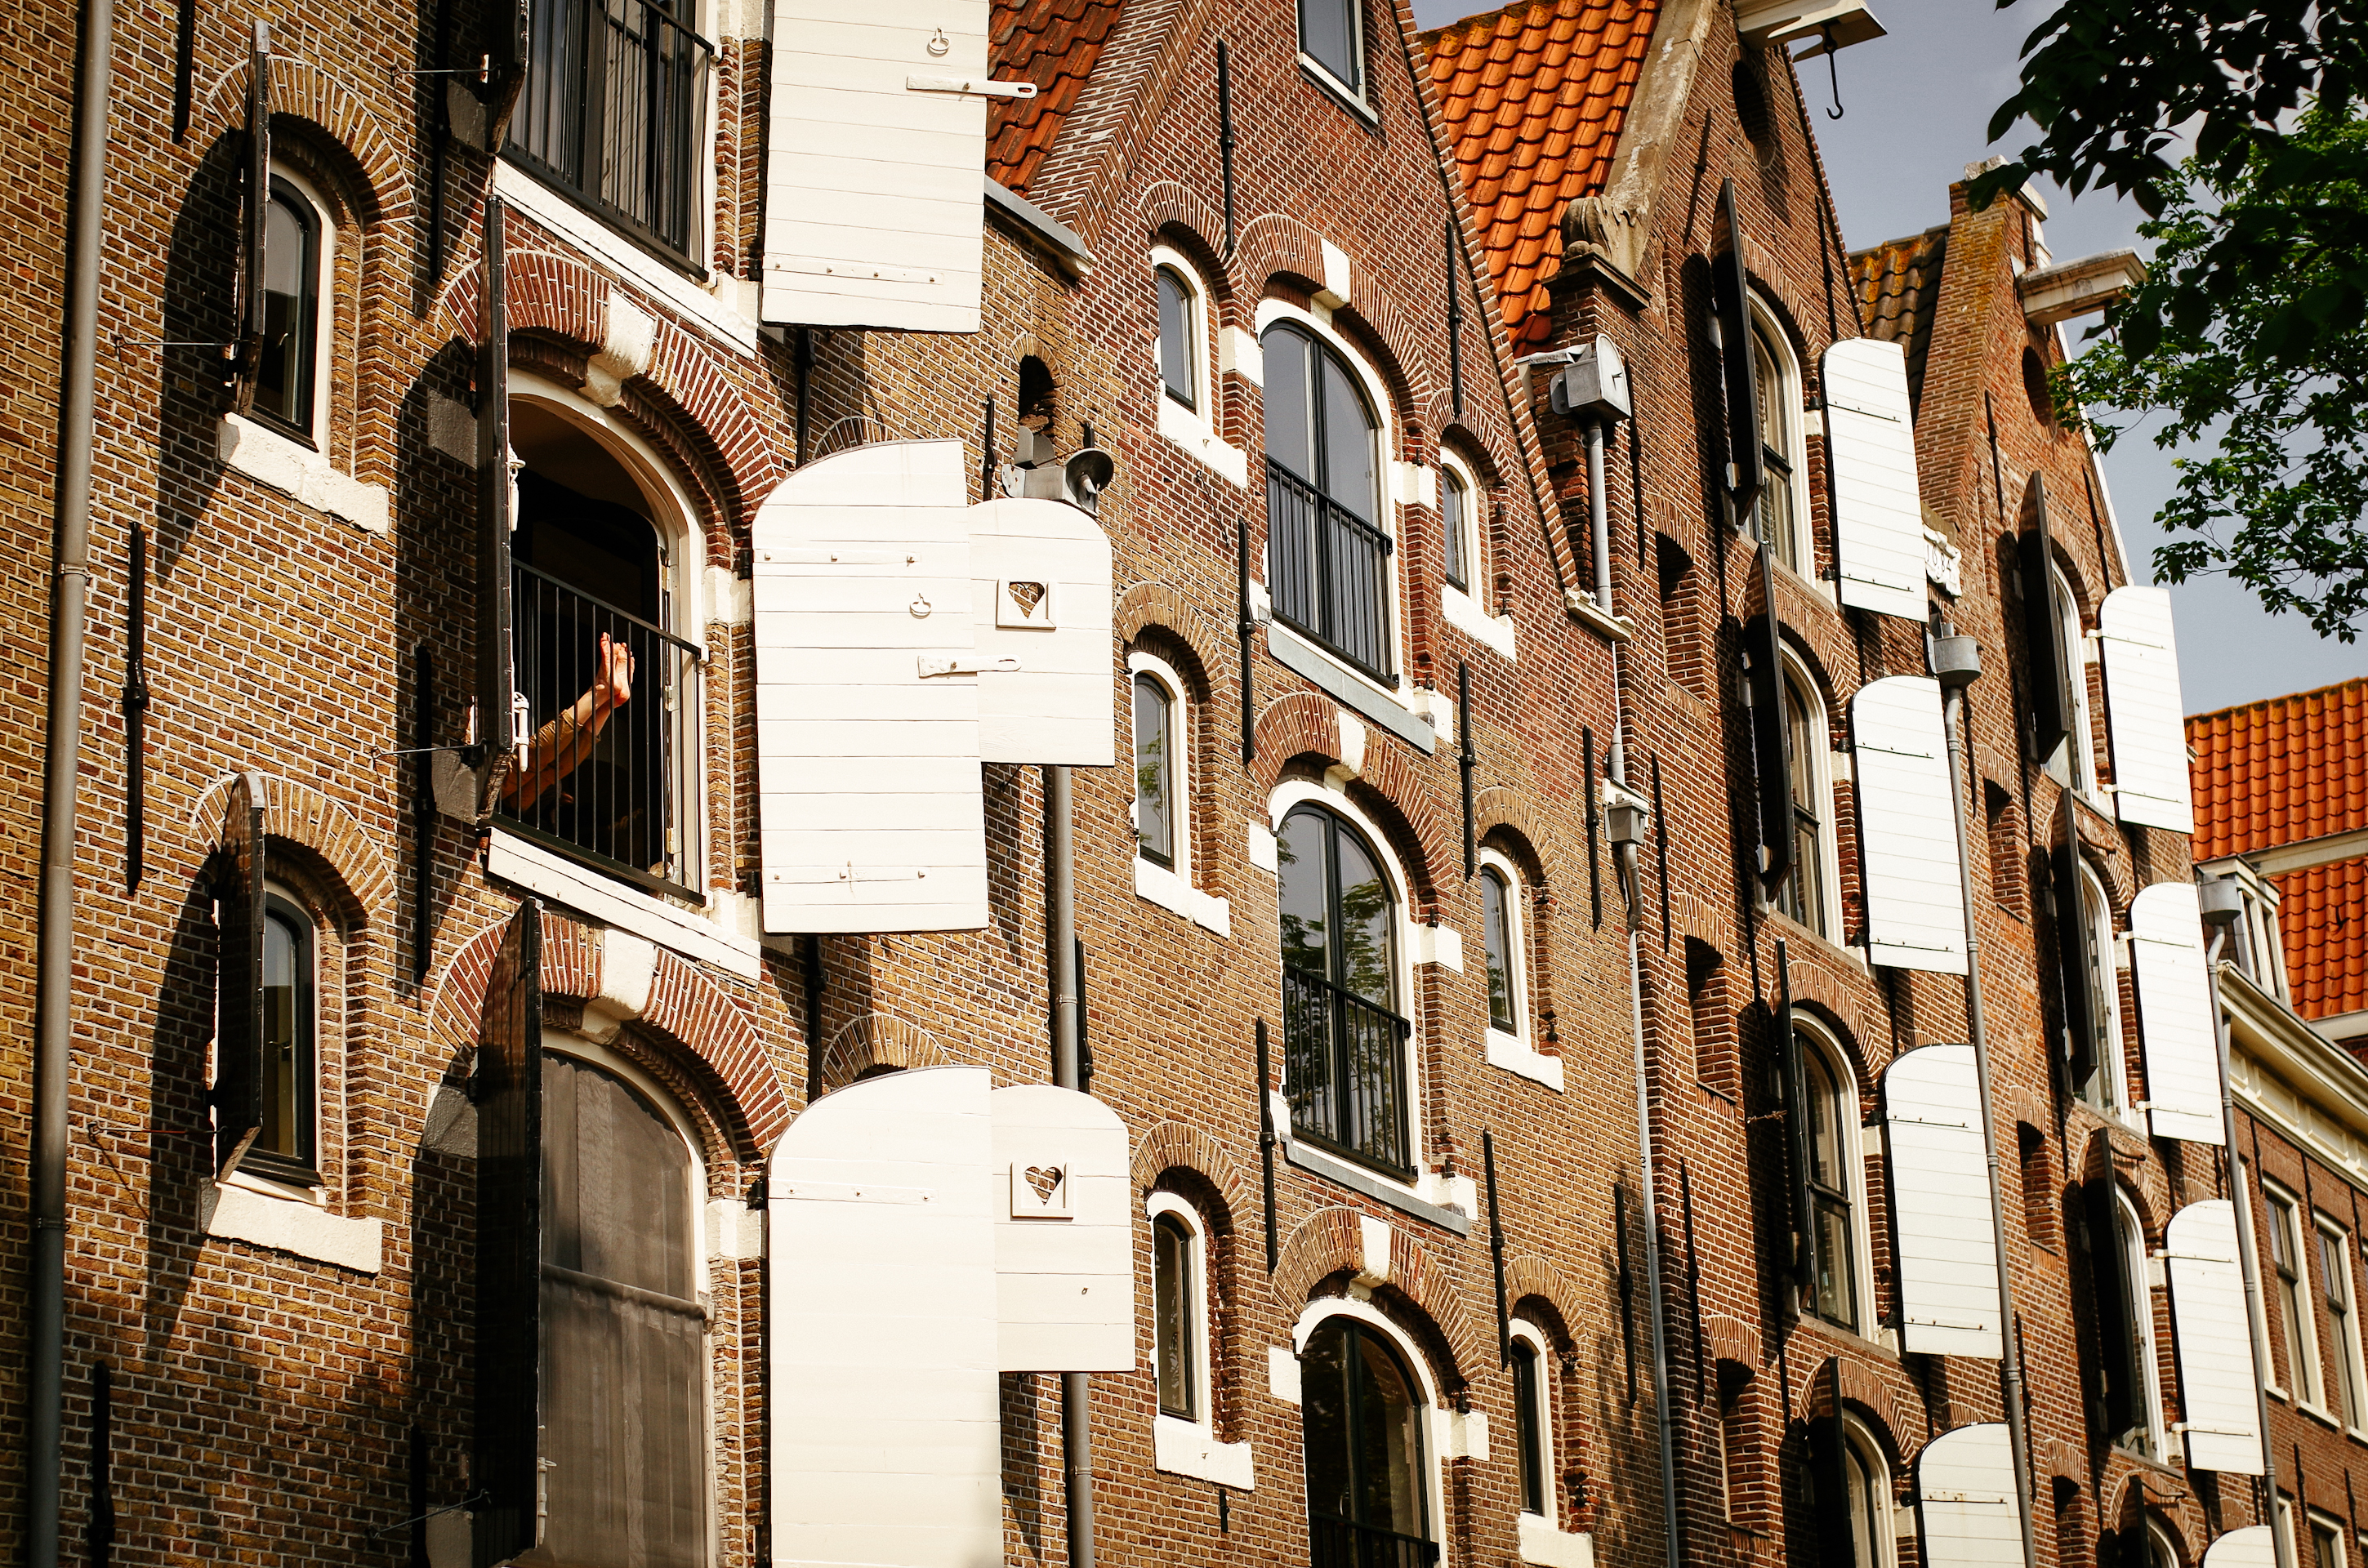 2016 Amsterdam